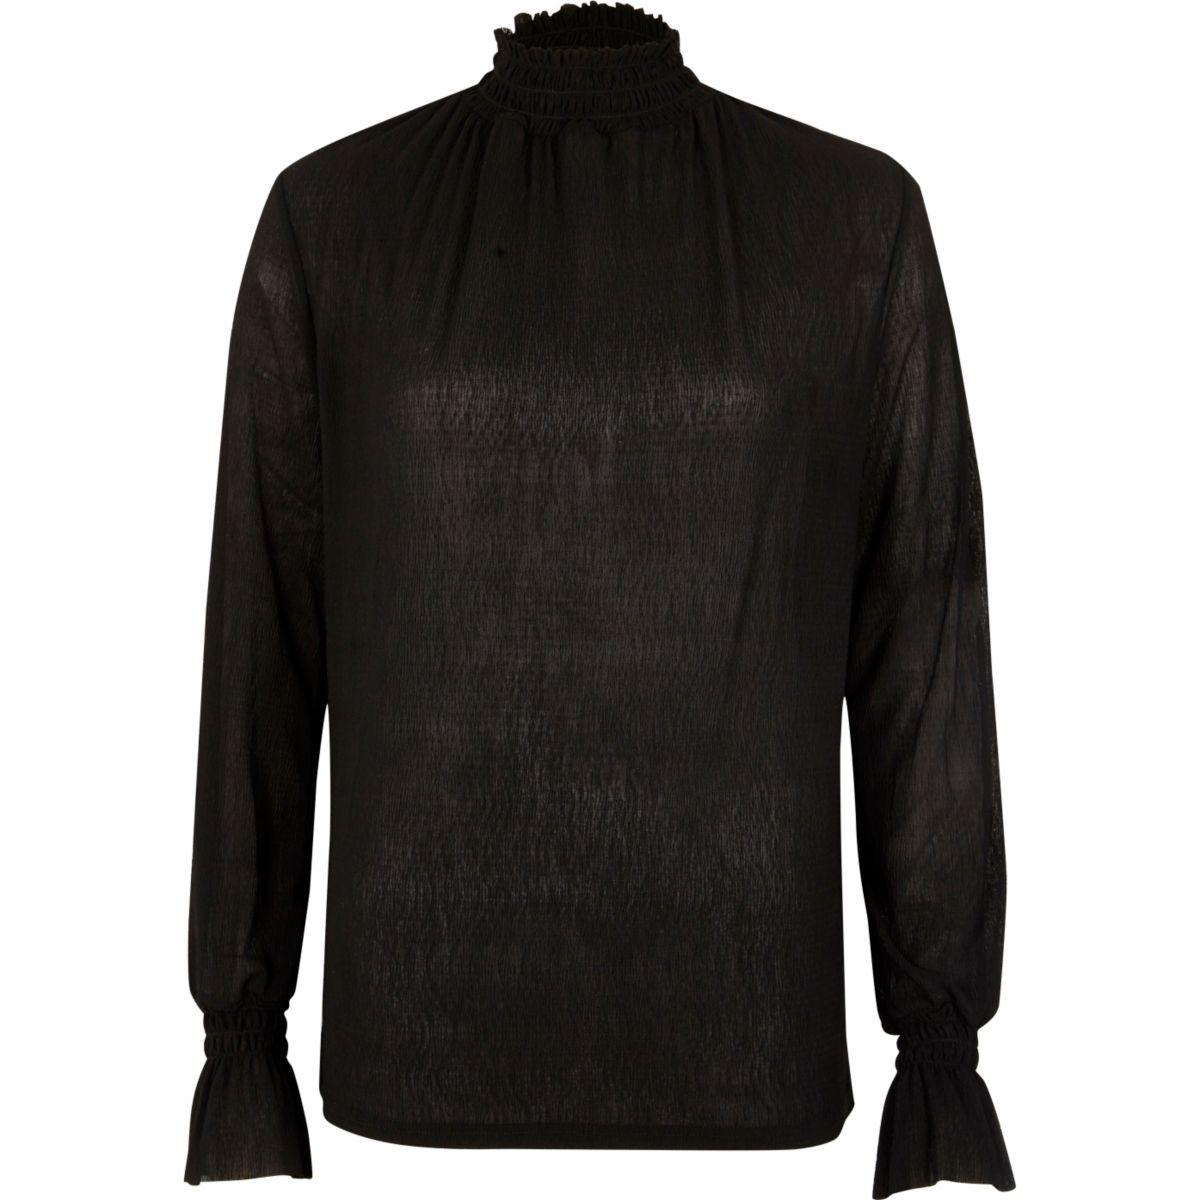 Black shirred neck textured mesh top